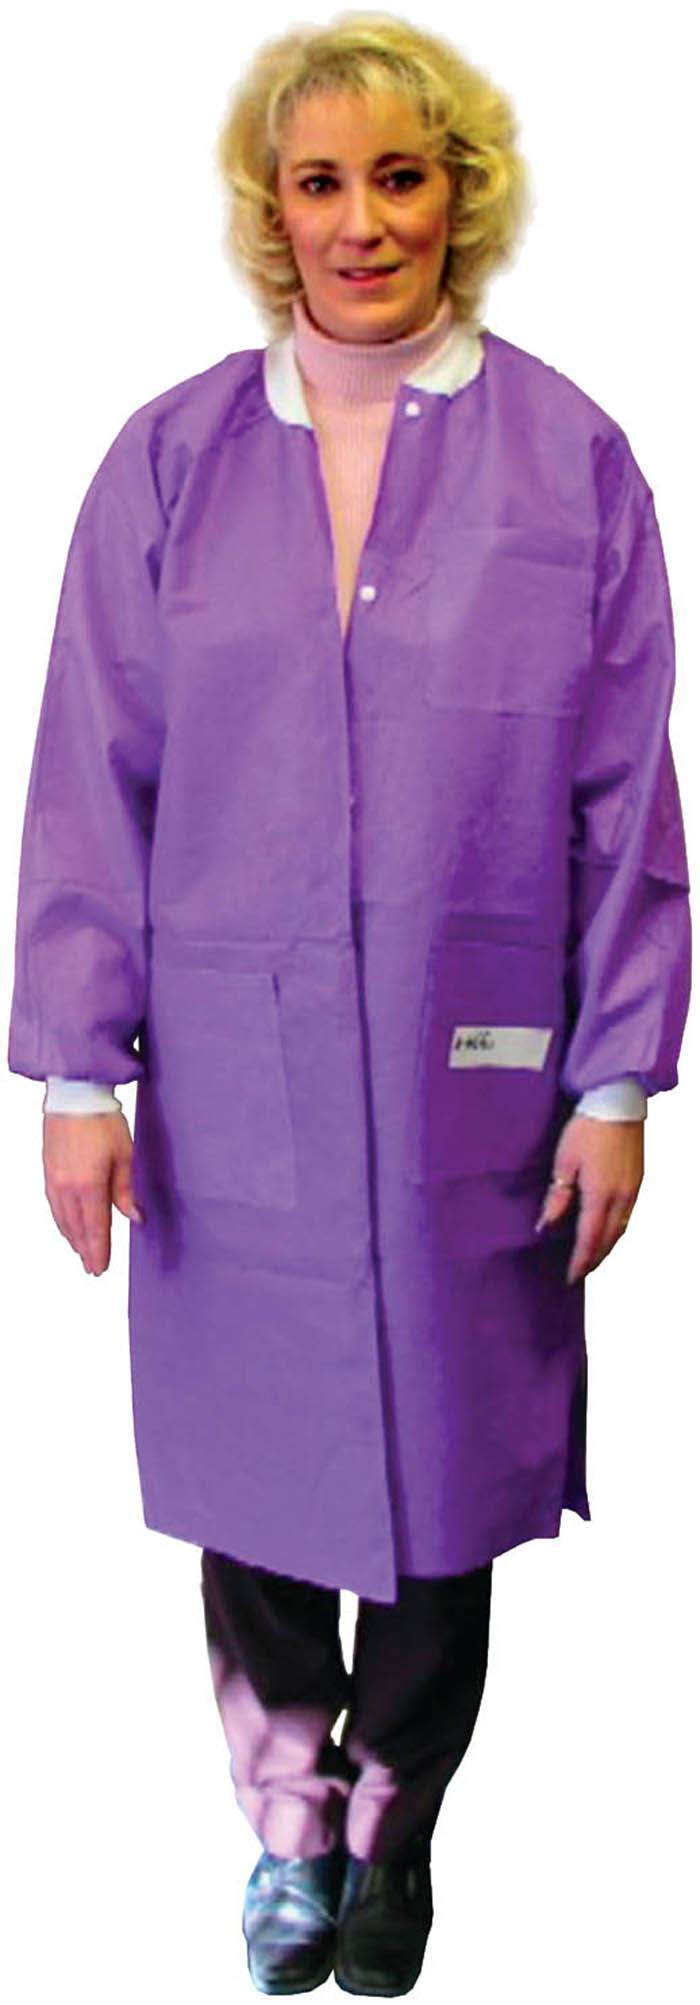 Disposable Lab Jacket. Hip length. Teal Green. Medium